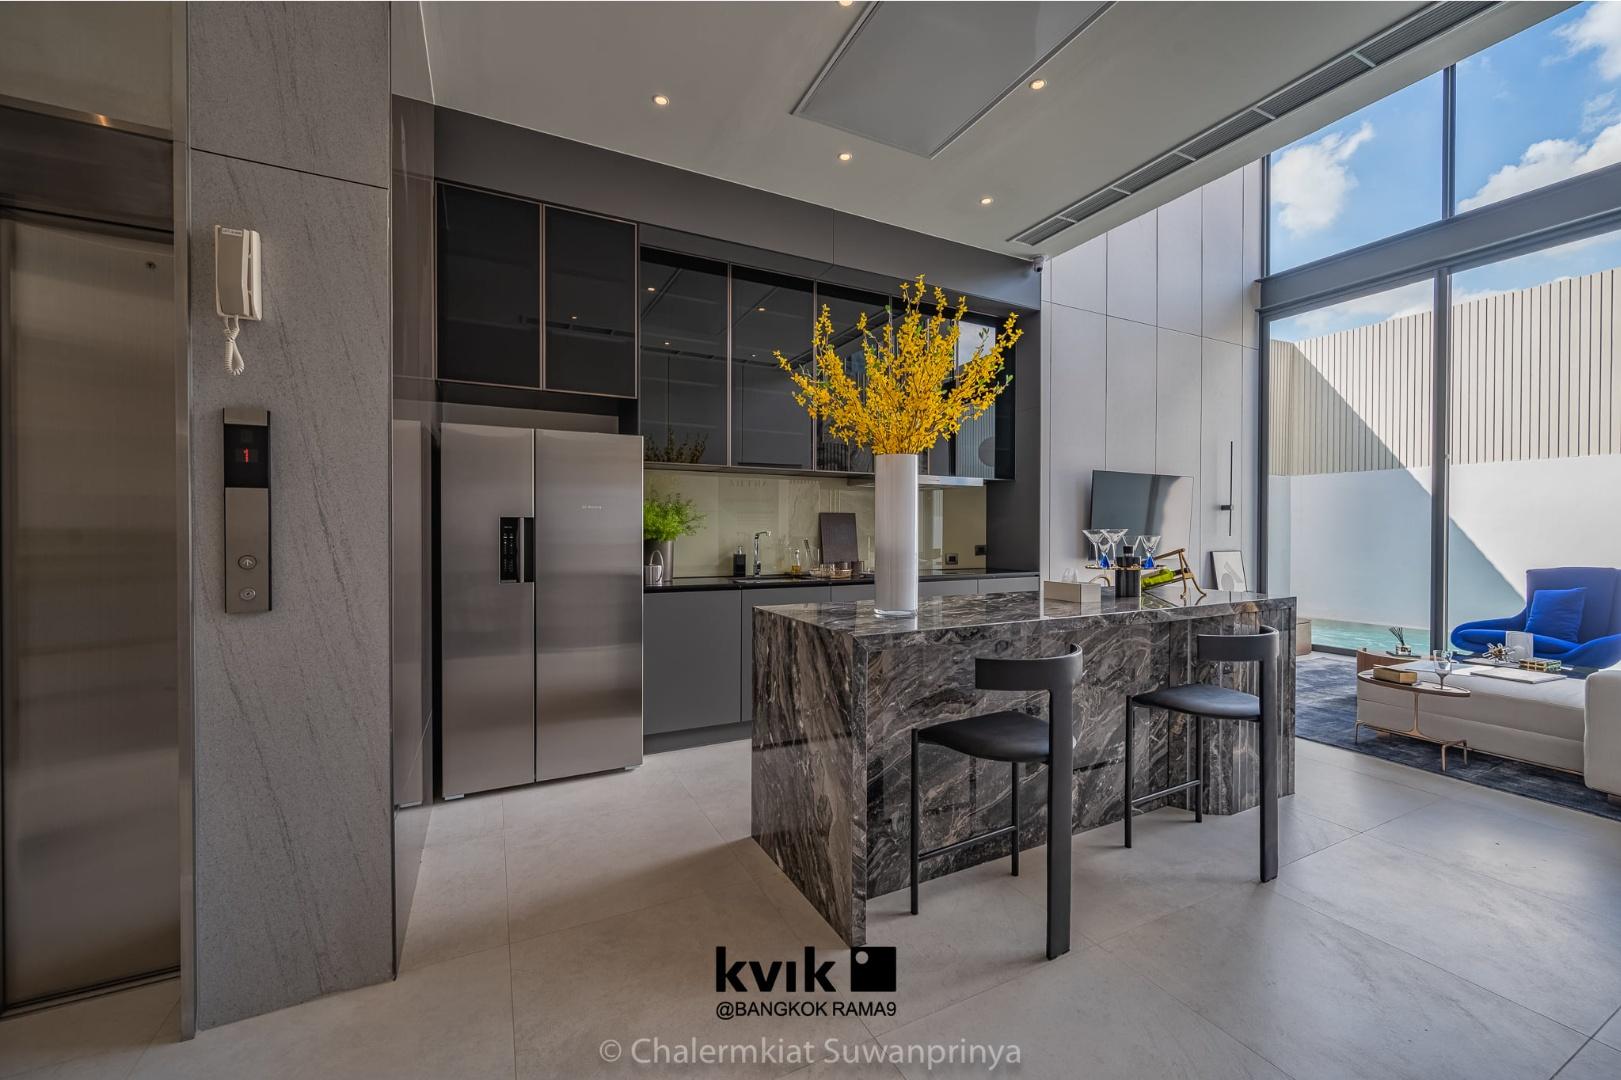 Prato grey kitchen Kvik Rama 9.jpg